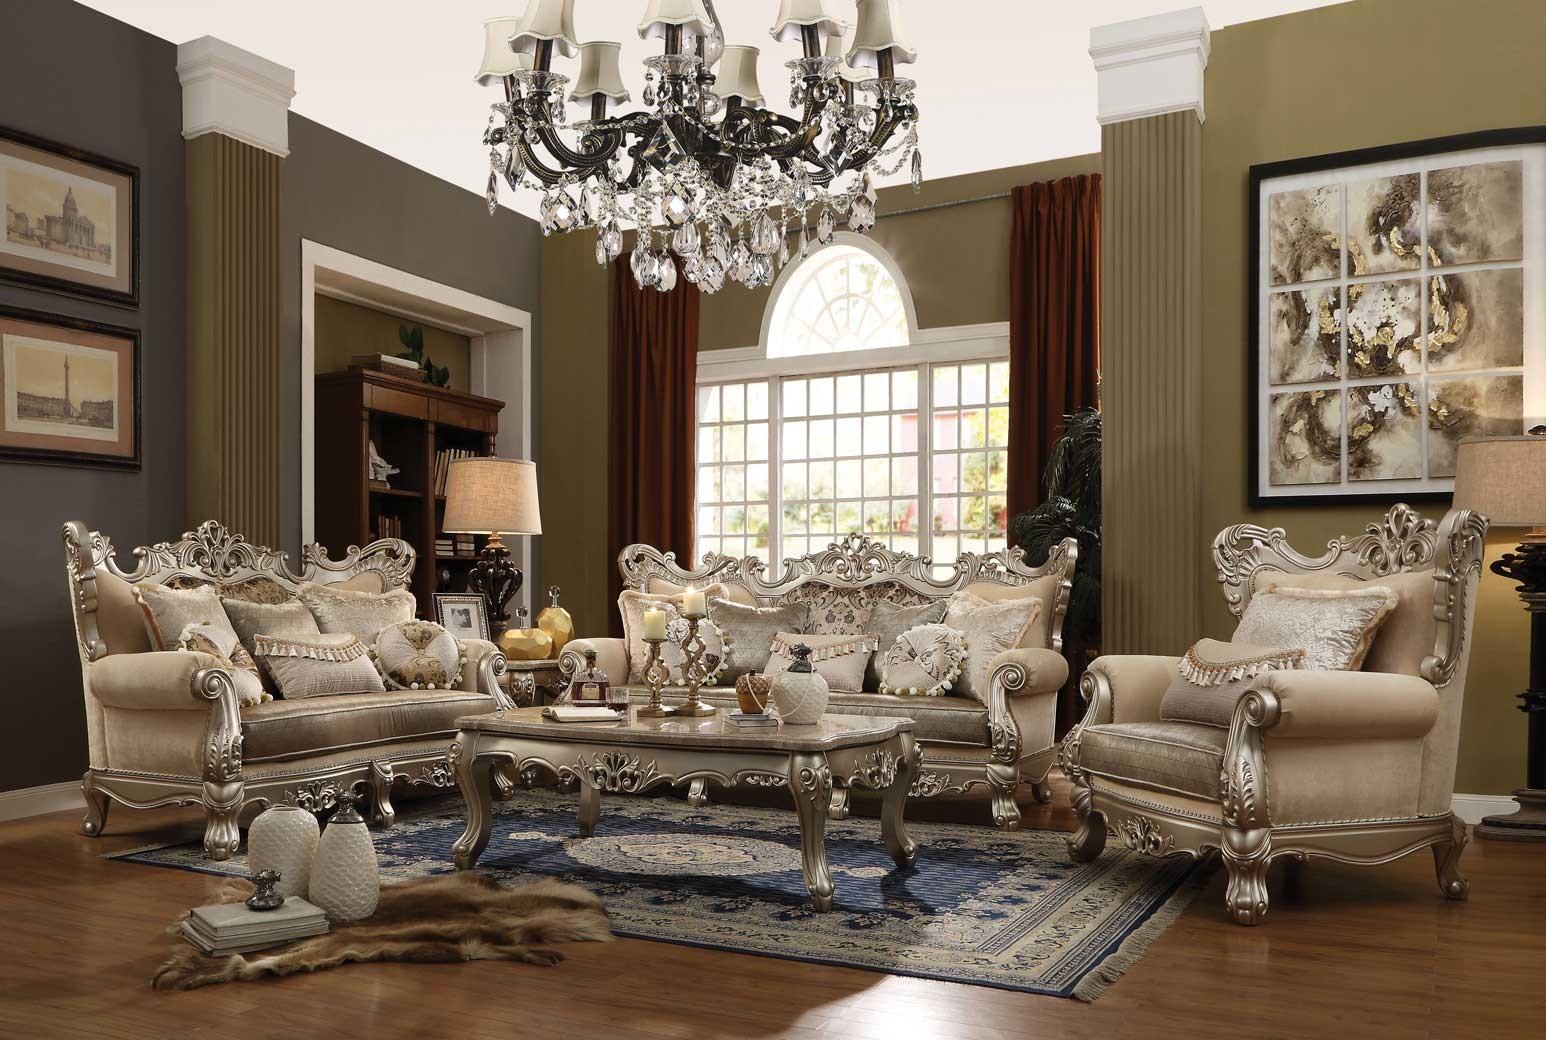 51040 Acme Ranita Collection 3 Pcs Sofa Set Fabric / Champagne